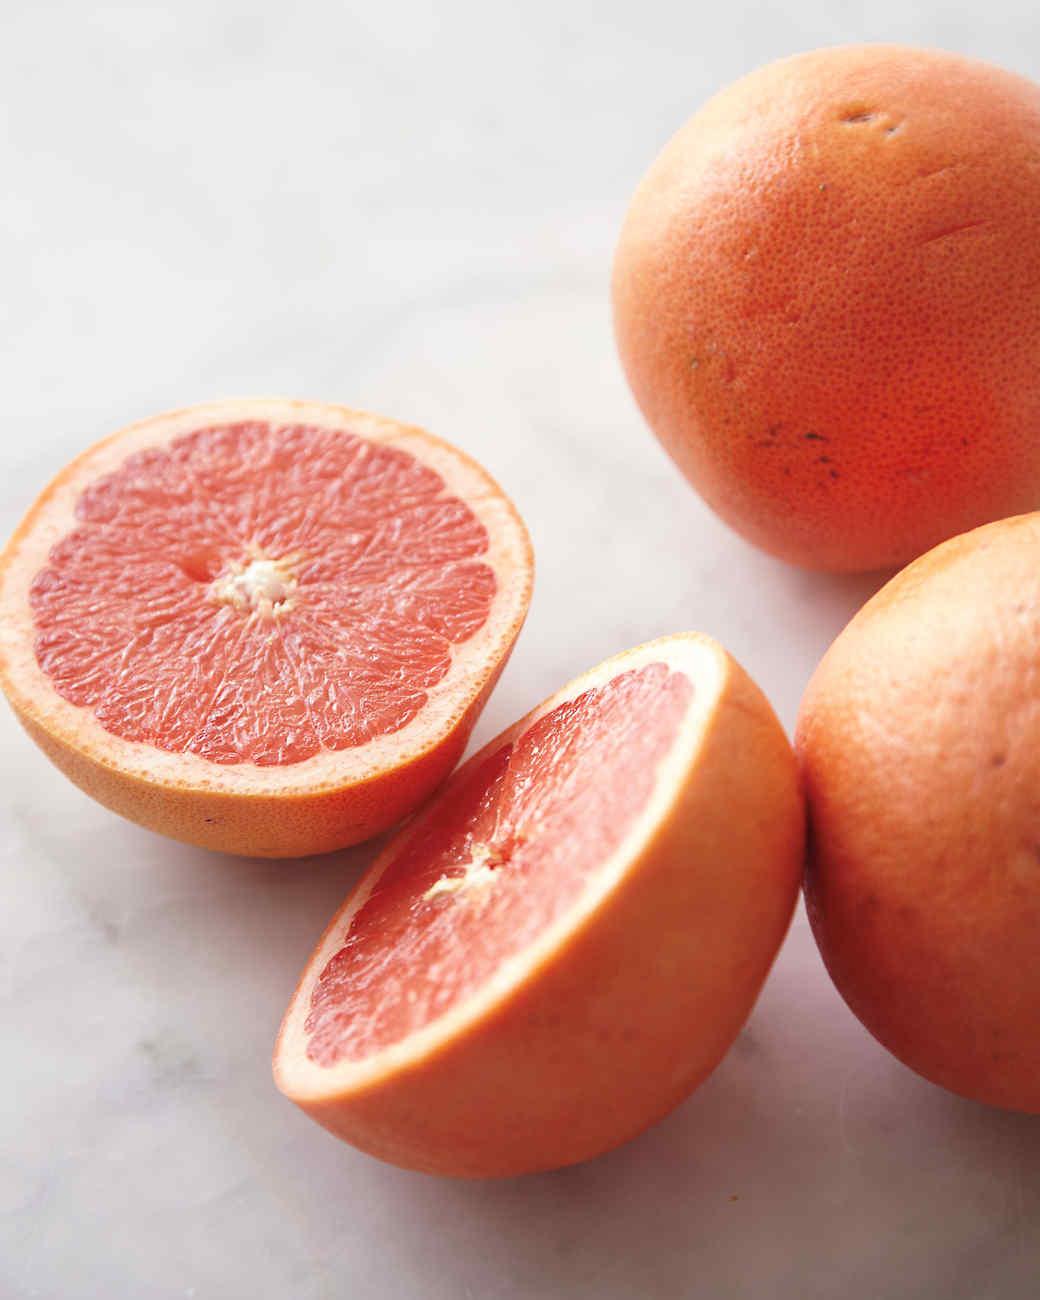 grapefruit-006-mld110677.jpg